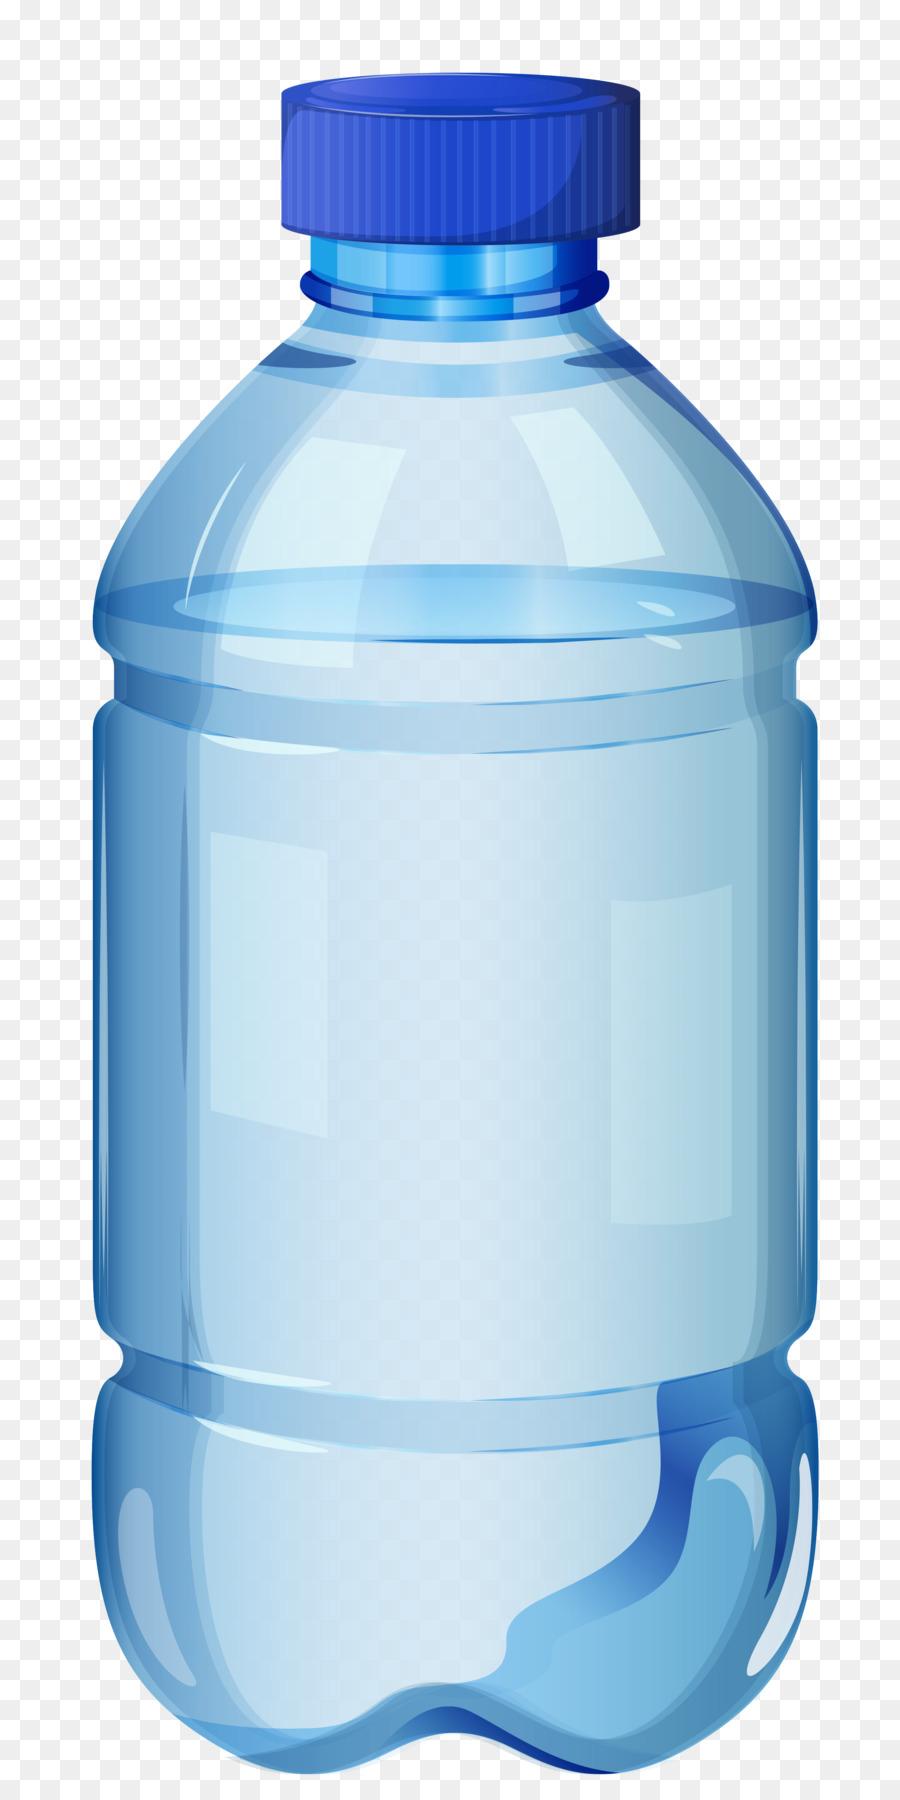 Wasserflasche clipart vector library download Mineralwasser-Wasser-Flaschen-clipart - Flasche png ... vector library download